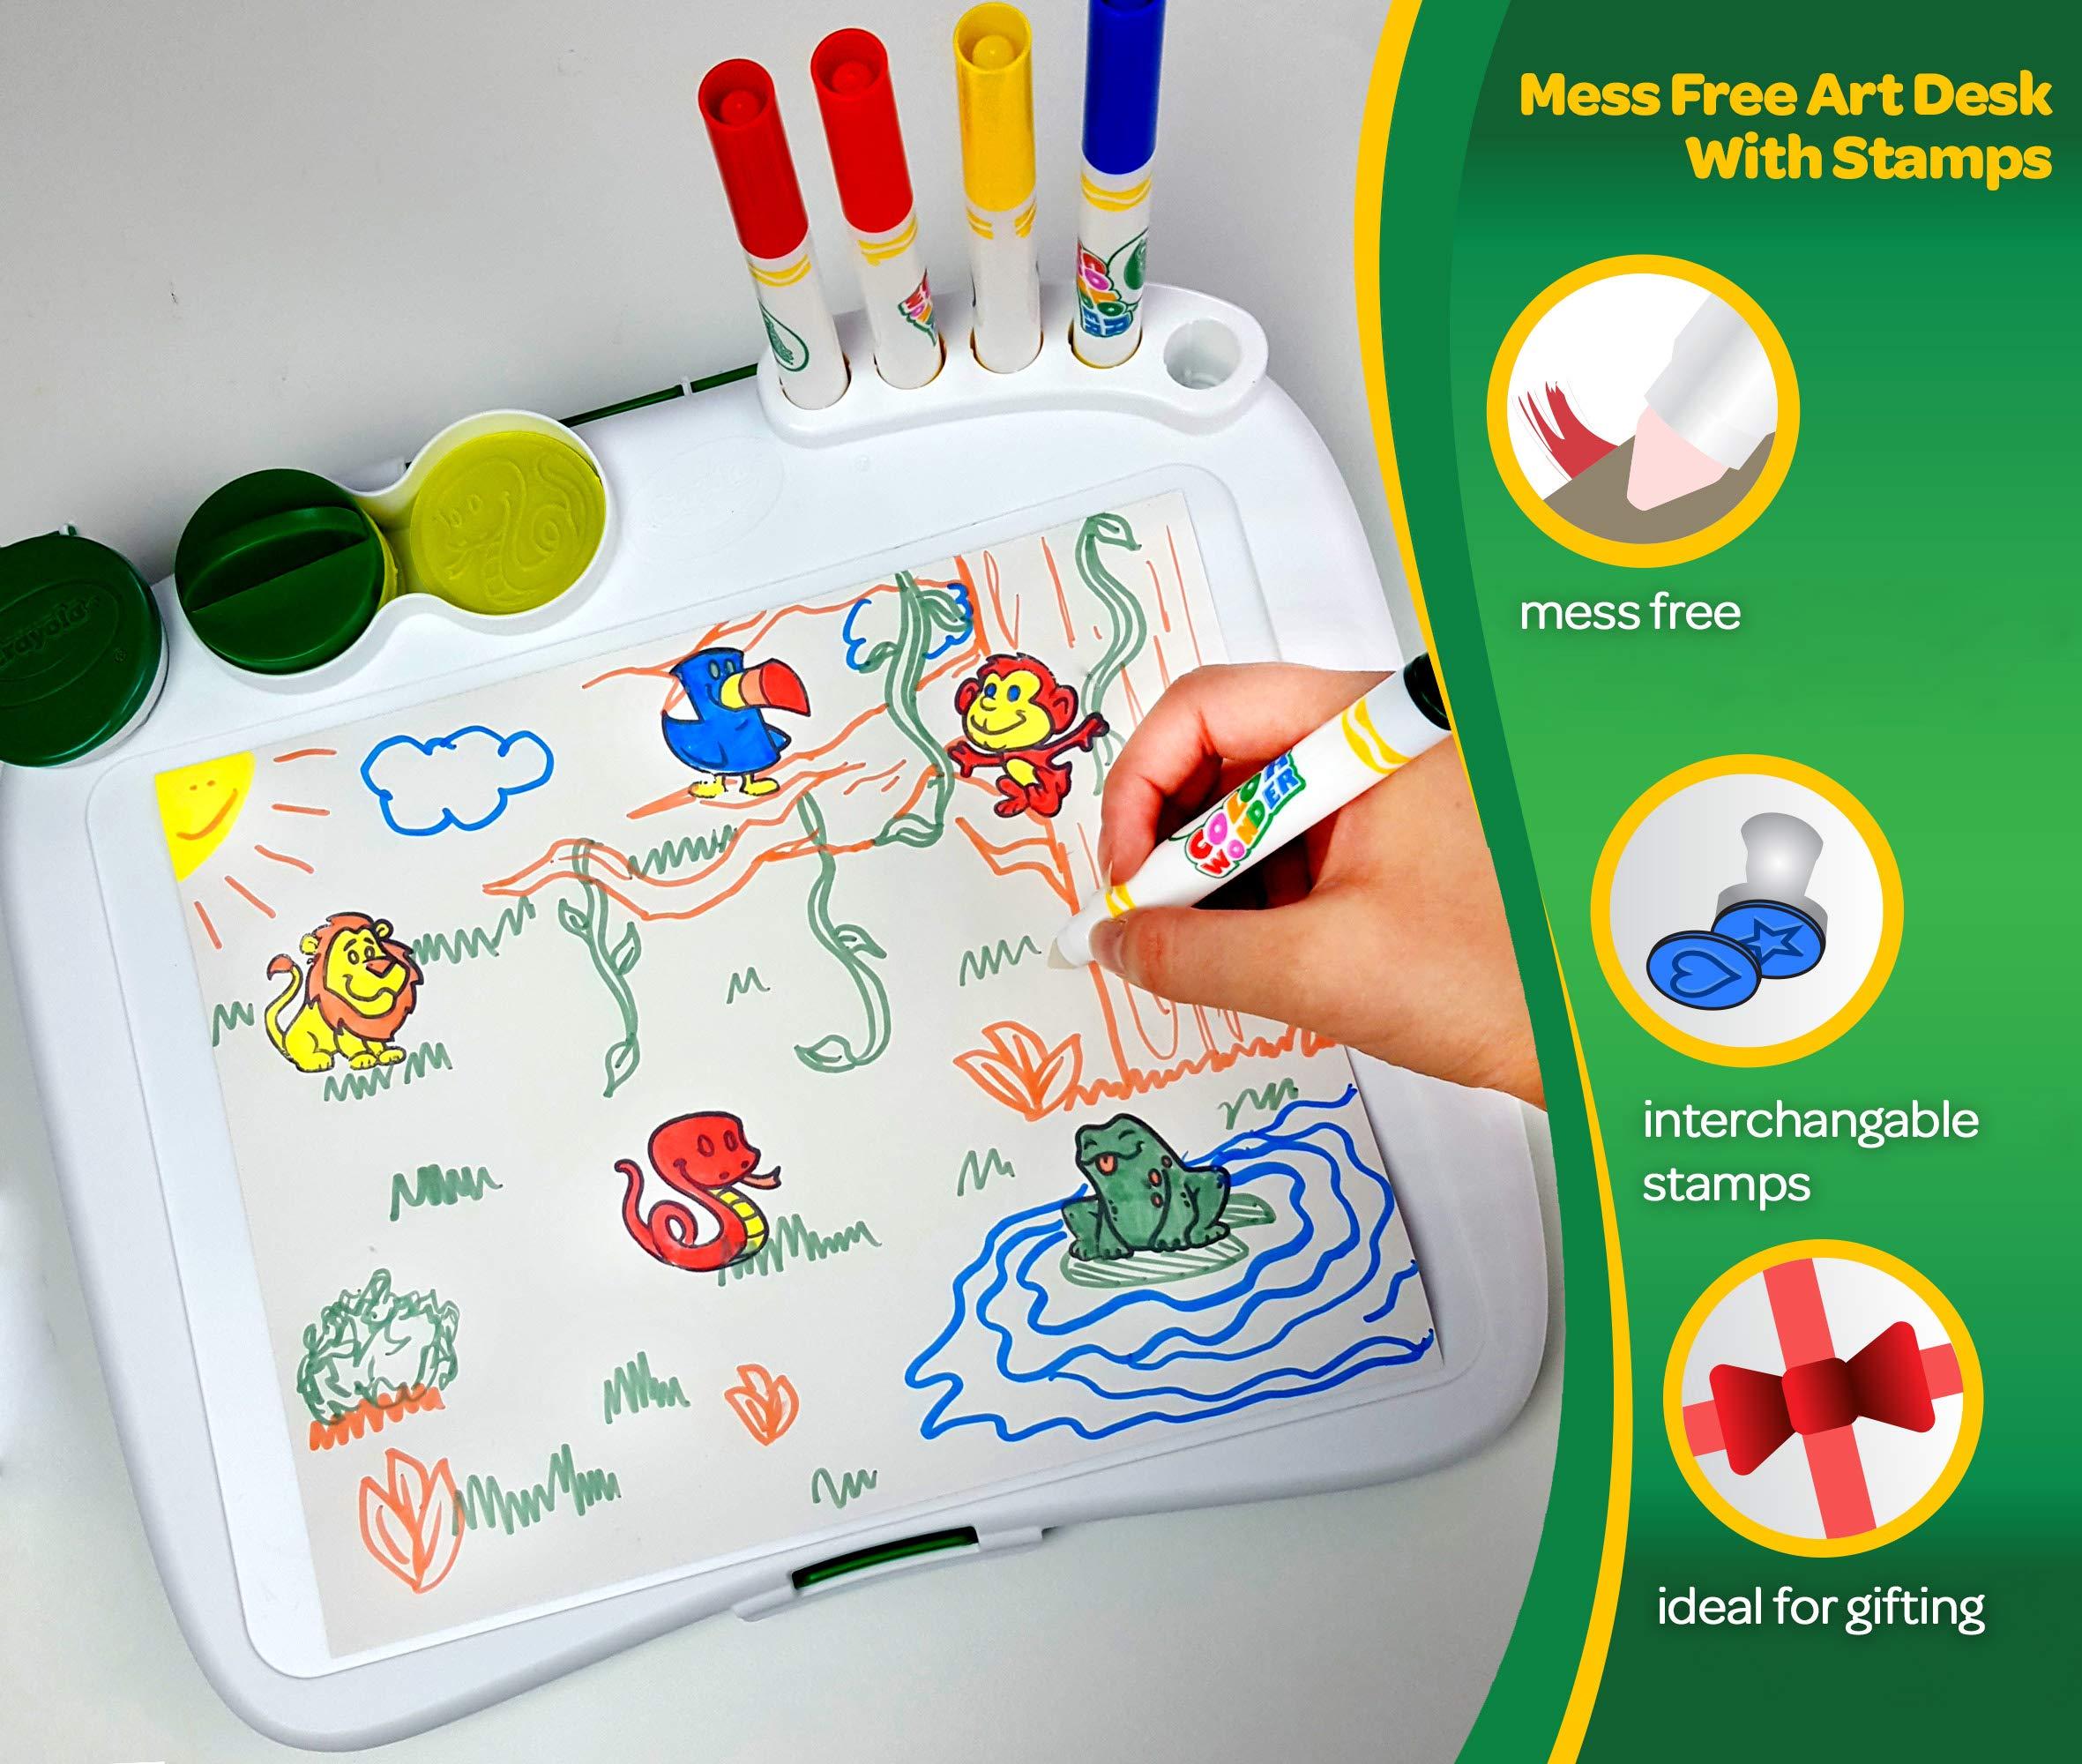 Crayola Color Wonder Mess Free Coloring Desk - Toys